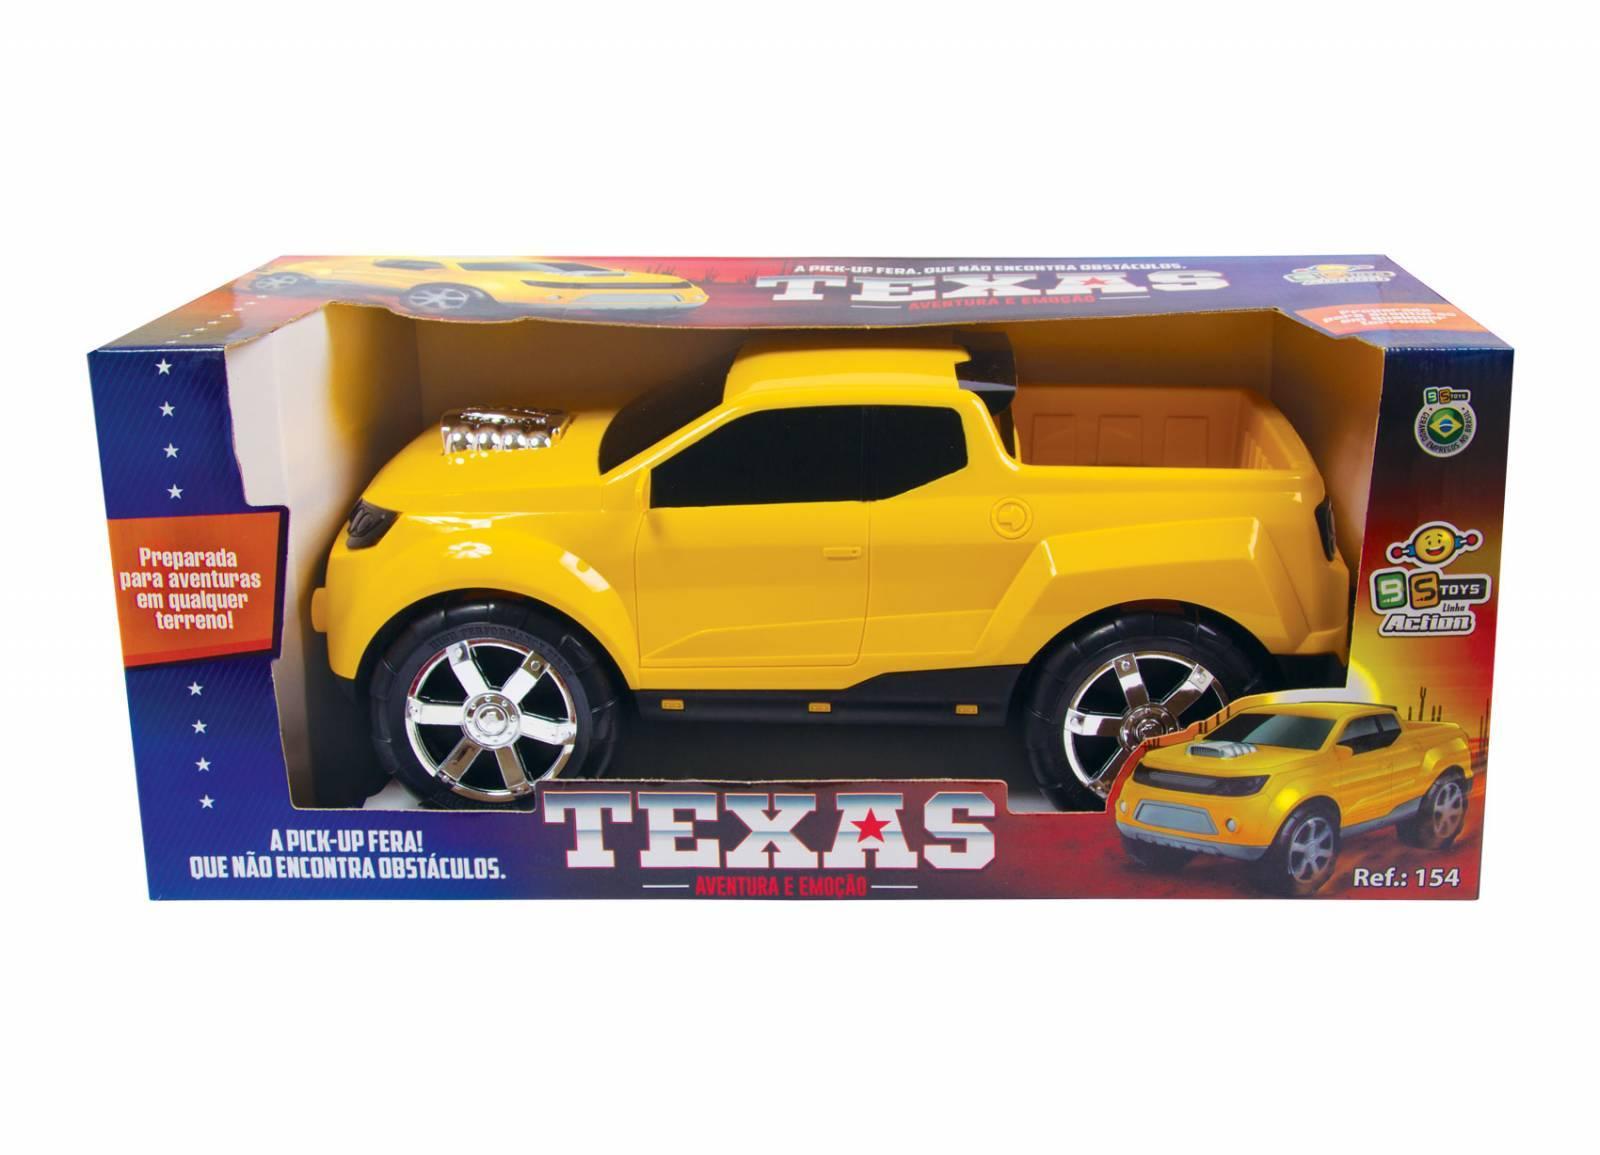 Pick Up Texas Linha Action - BS Toys 154 - Noy Brinquedos